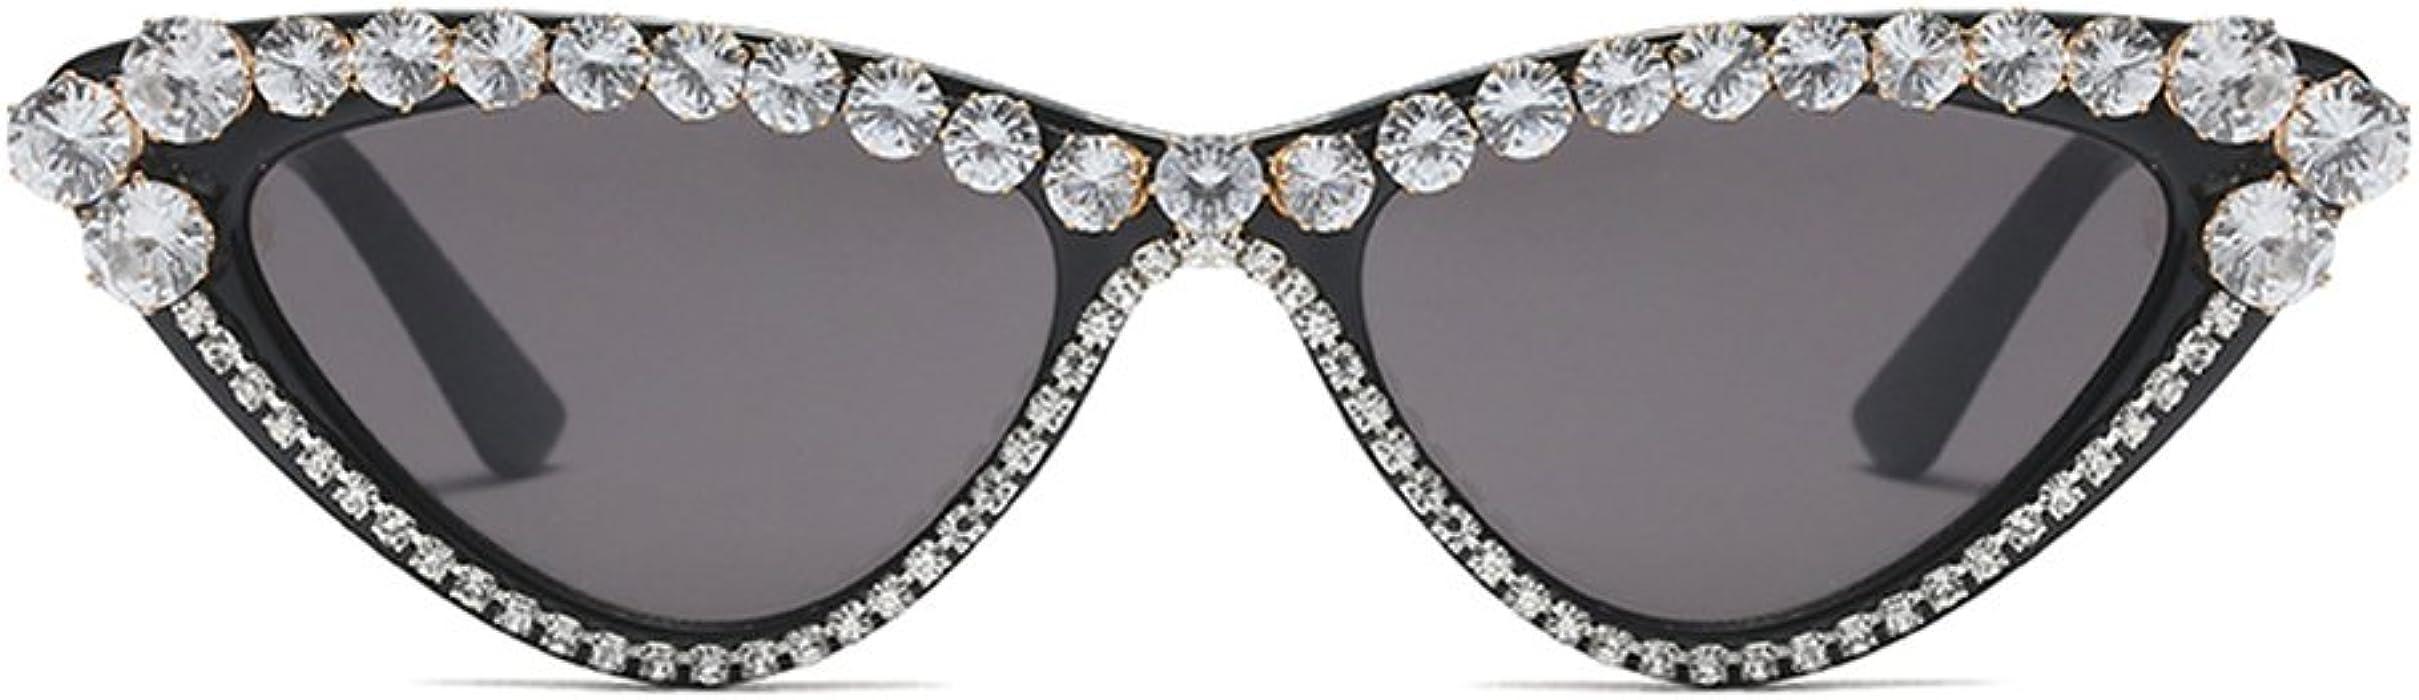 62e98735600 Rhinestone Cat Eye Sunglasses Small Black Luxury Sun Glasses Woman Fashion  Summer